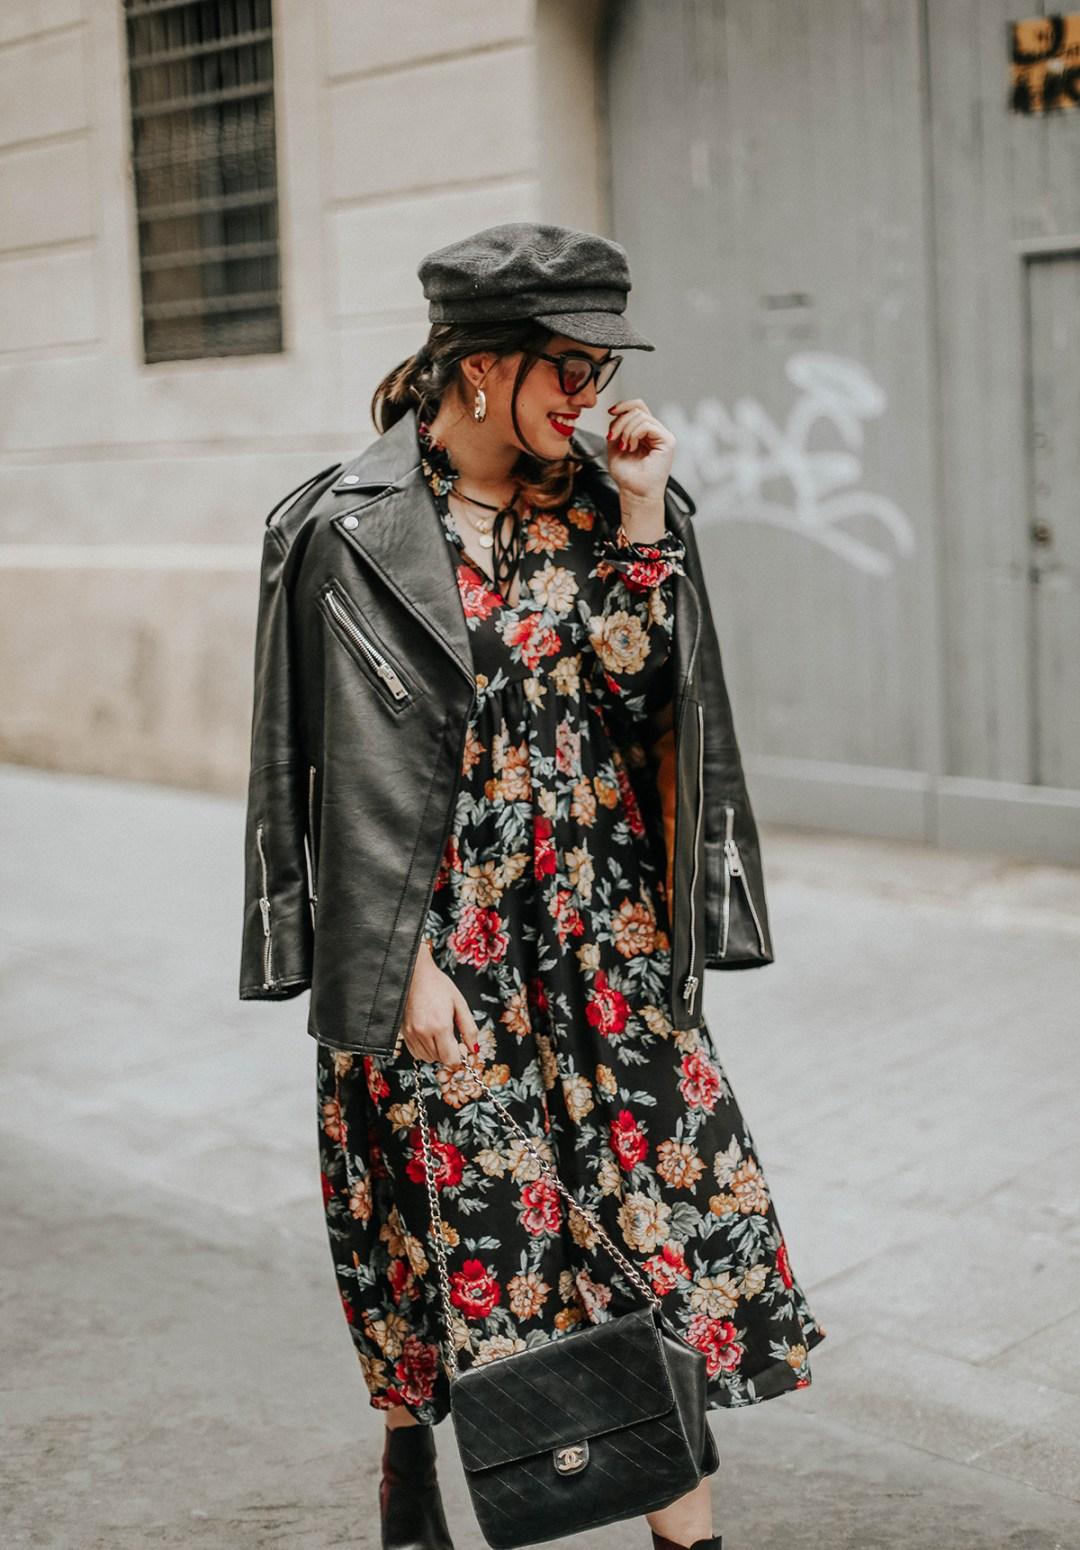 vestido-flores-midi-zara-botines-amazon-find-streetstyle13